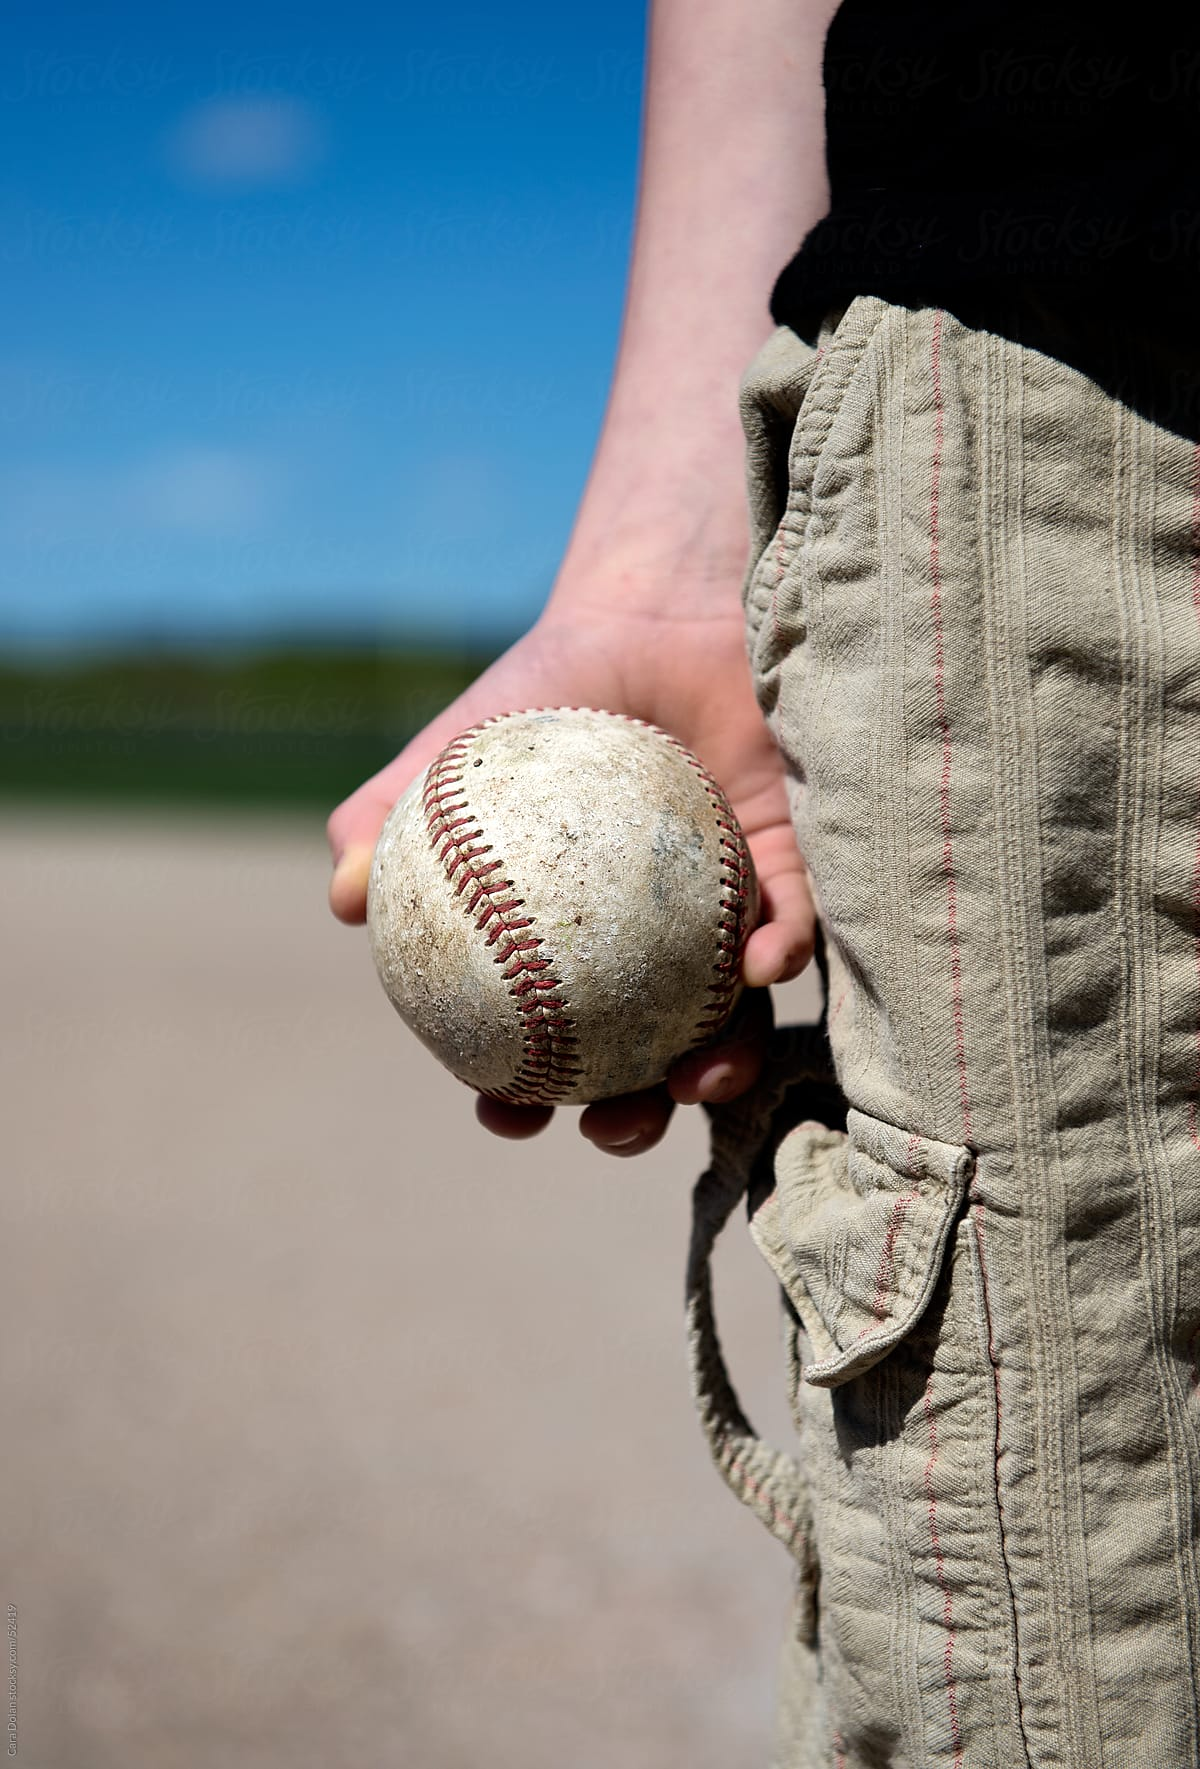 Cara Main Baseball : baseball, Boy's, Holding, Baseball, Dolan, Stocksy, United